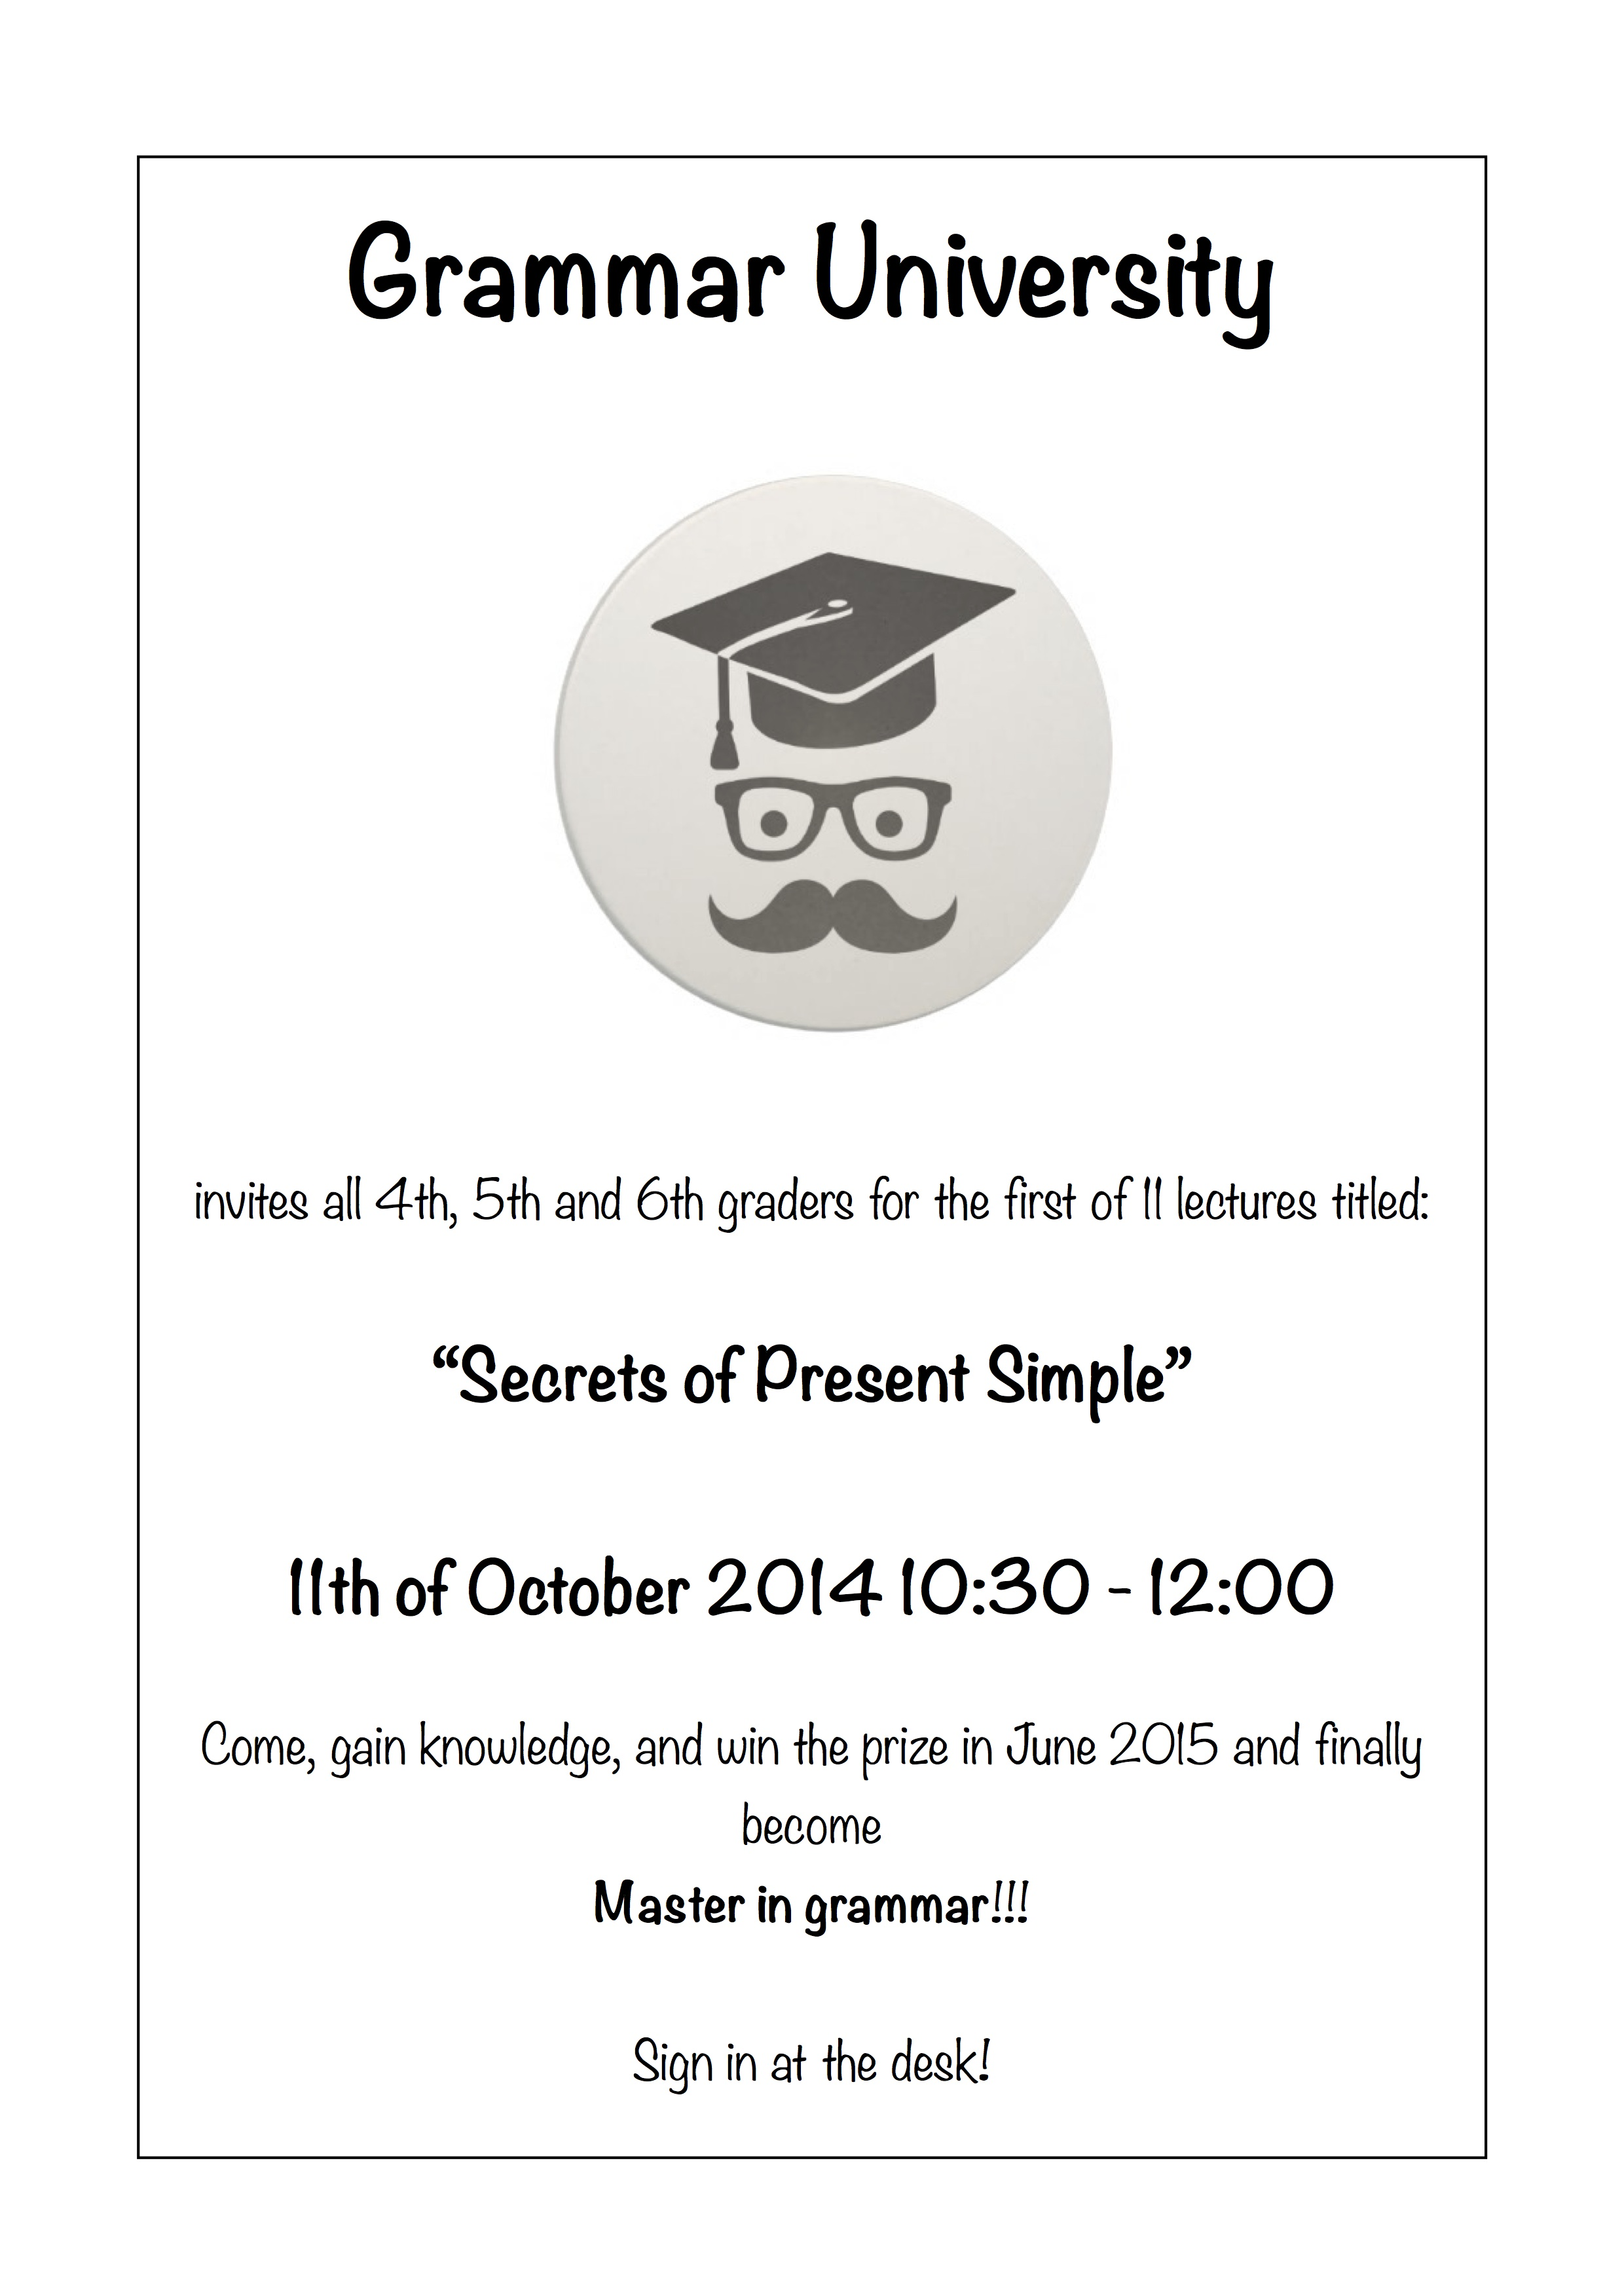 grammar academy poster